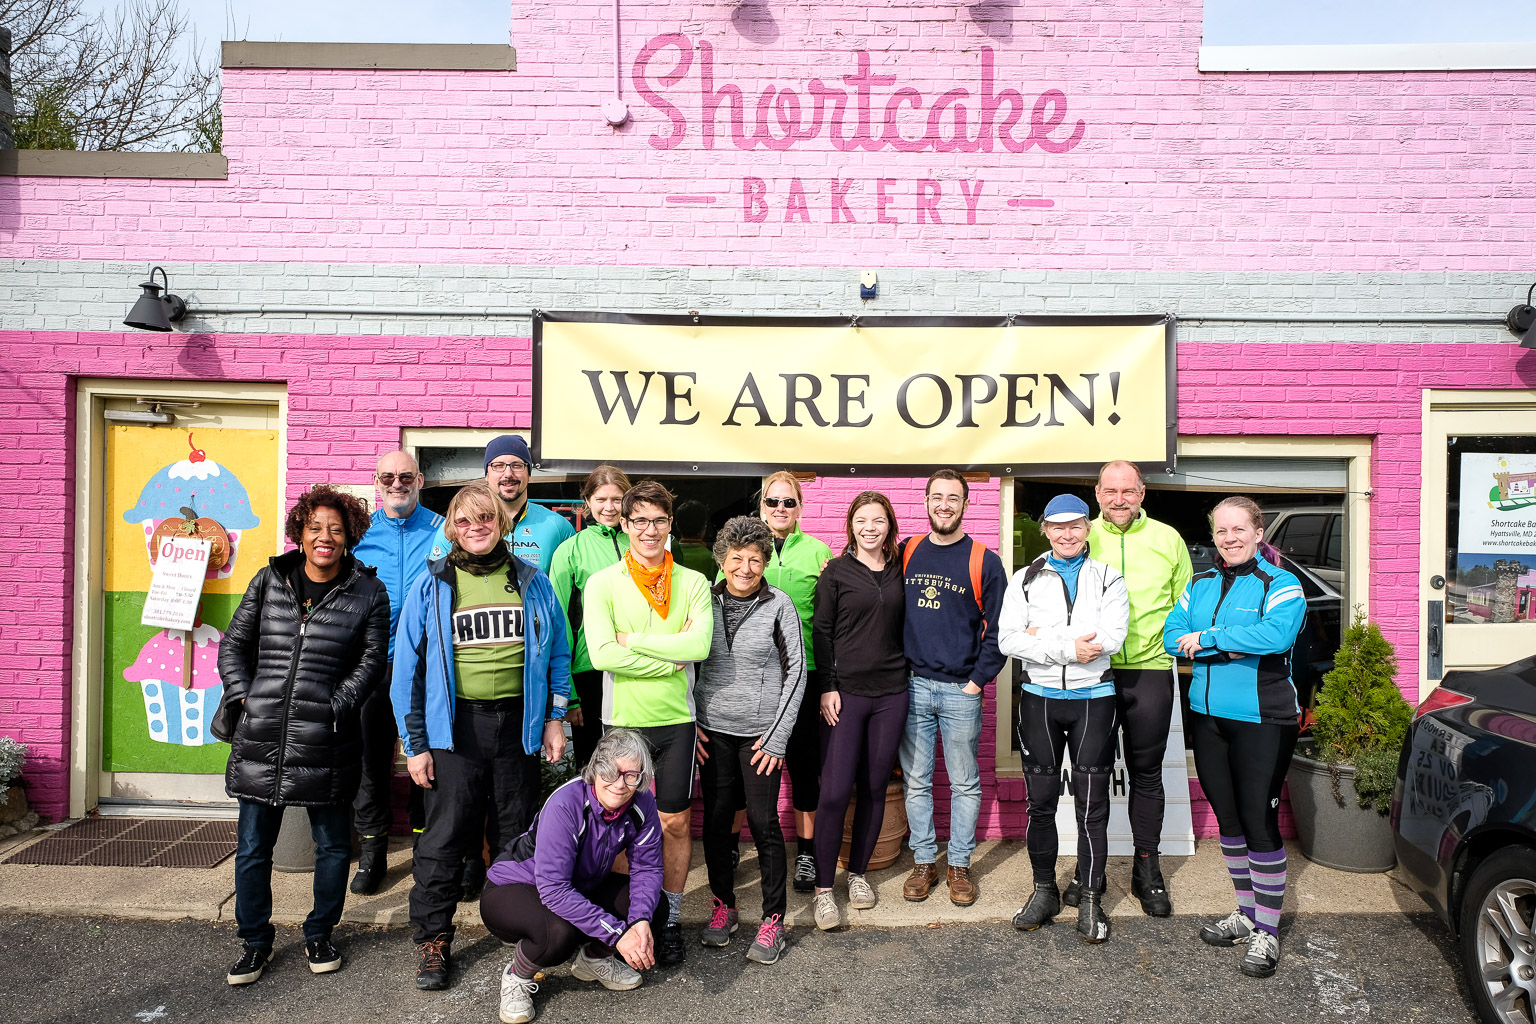 Shortcake_Reopening_11-18-17-028-Lenzy-Ruffin-Event-Photography-Washington-DC-Fuji-X-T2.jpg